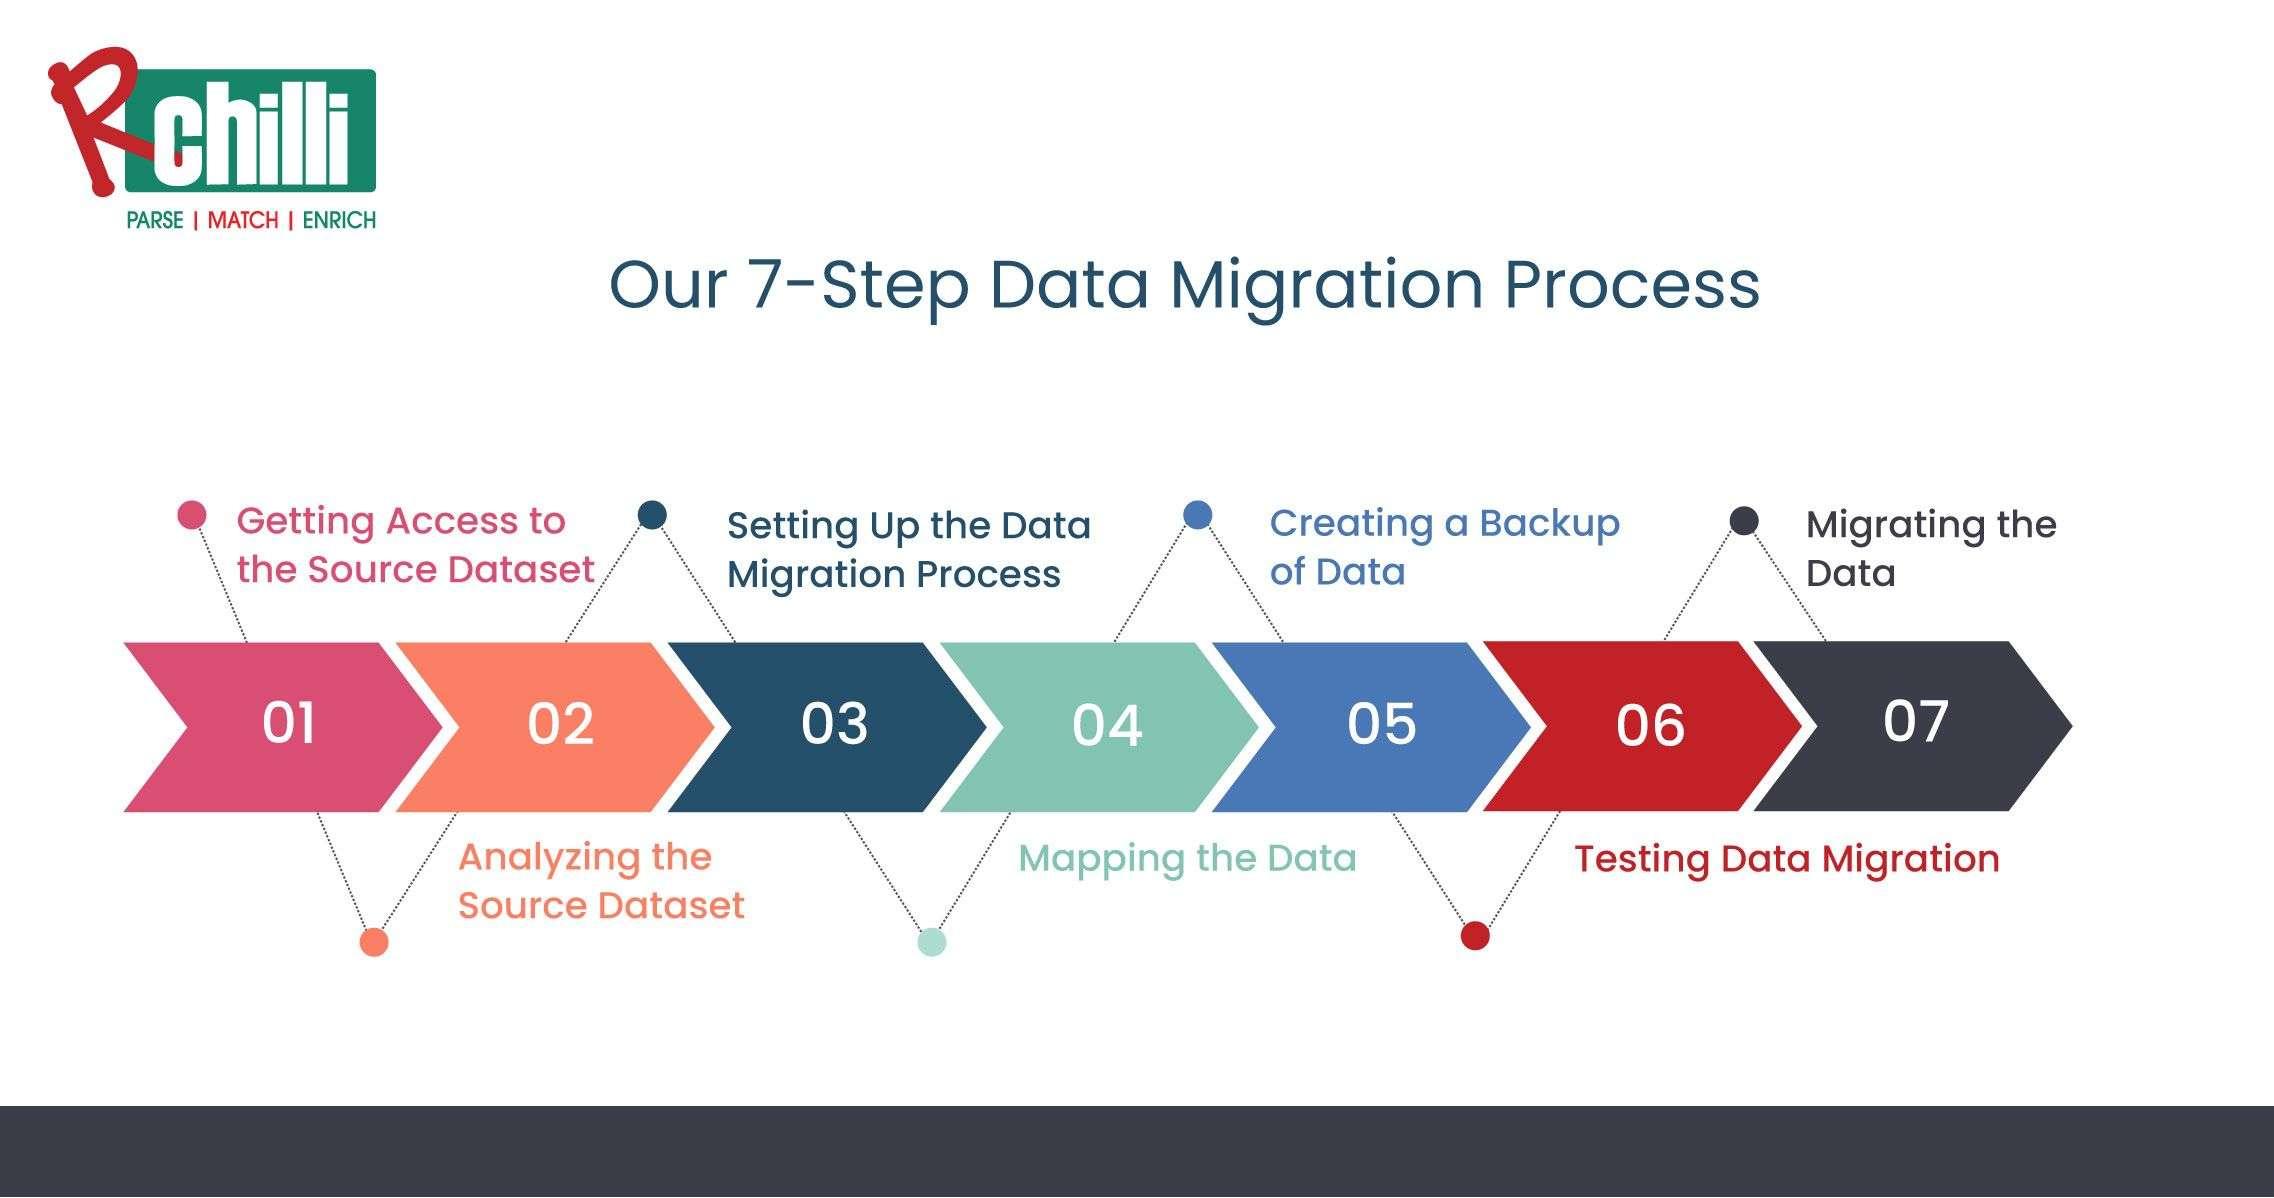 RChilli 7-Step Data Migration Process